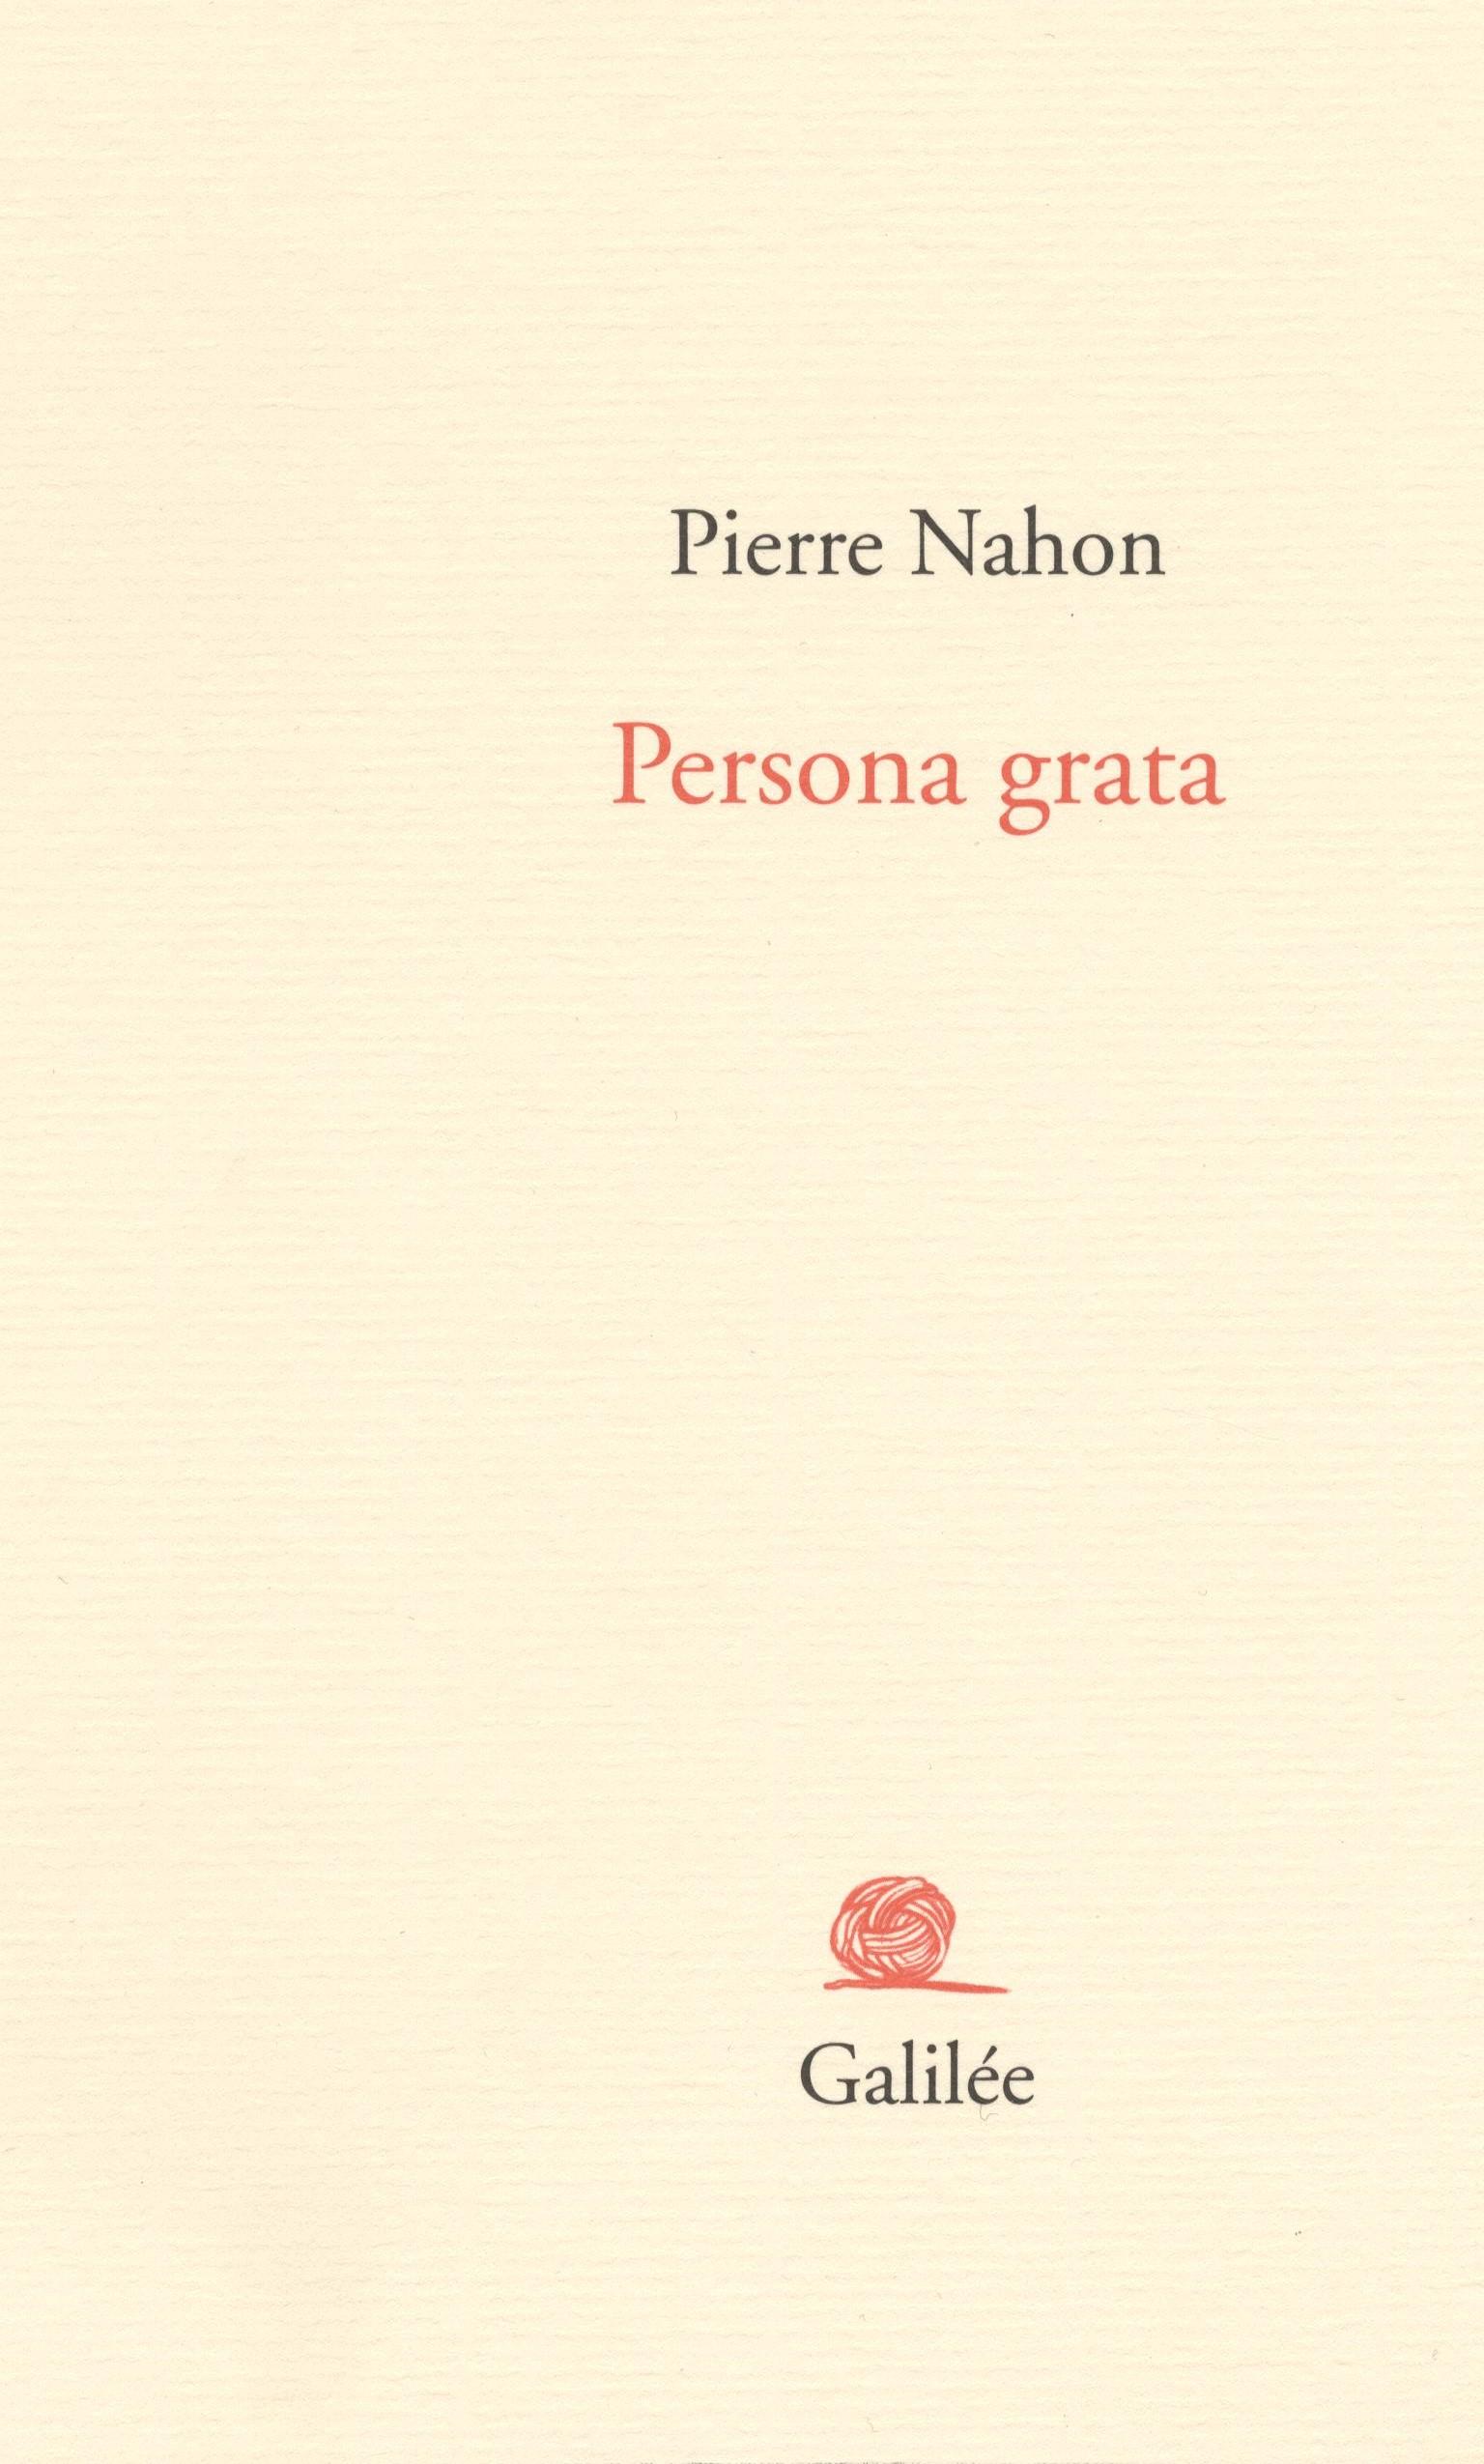 Pierre Nahon, Persona grata